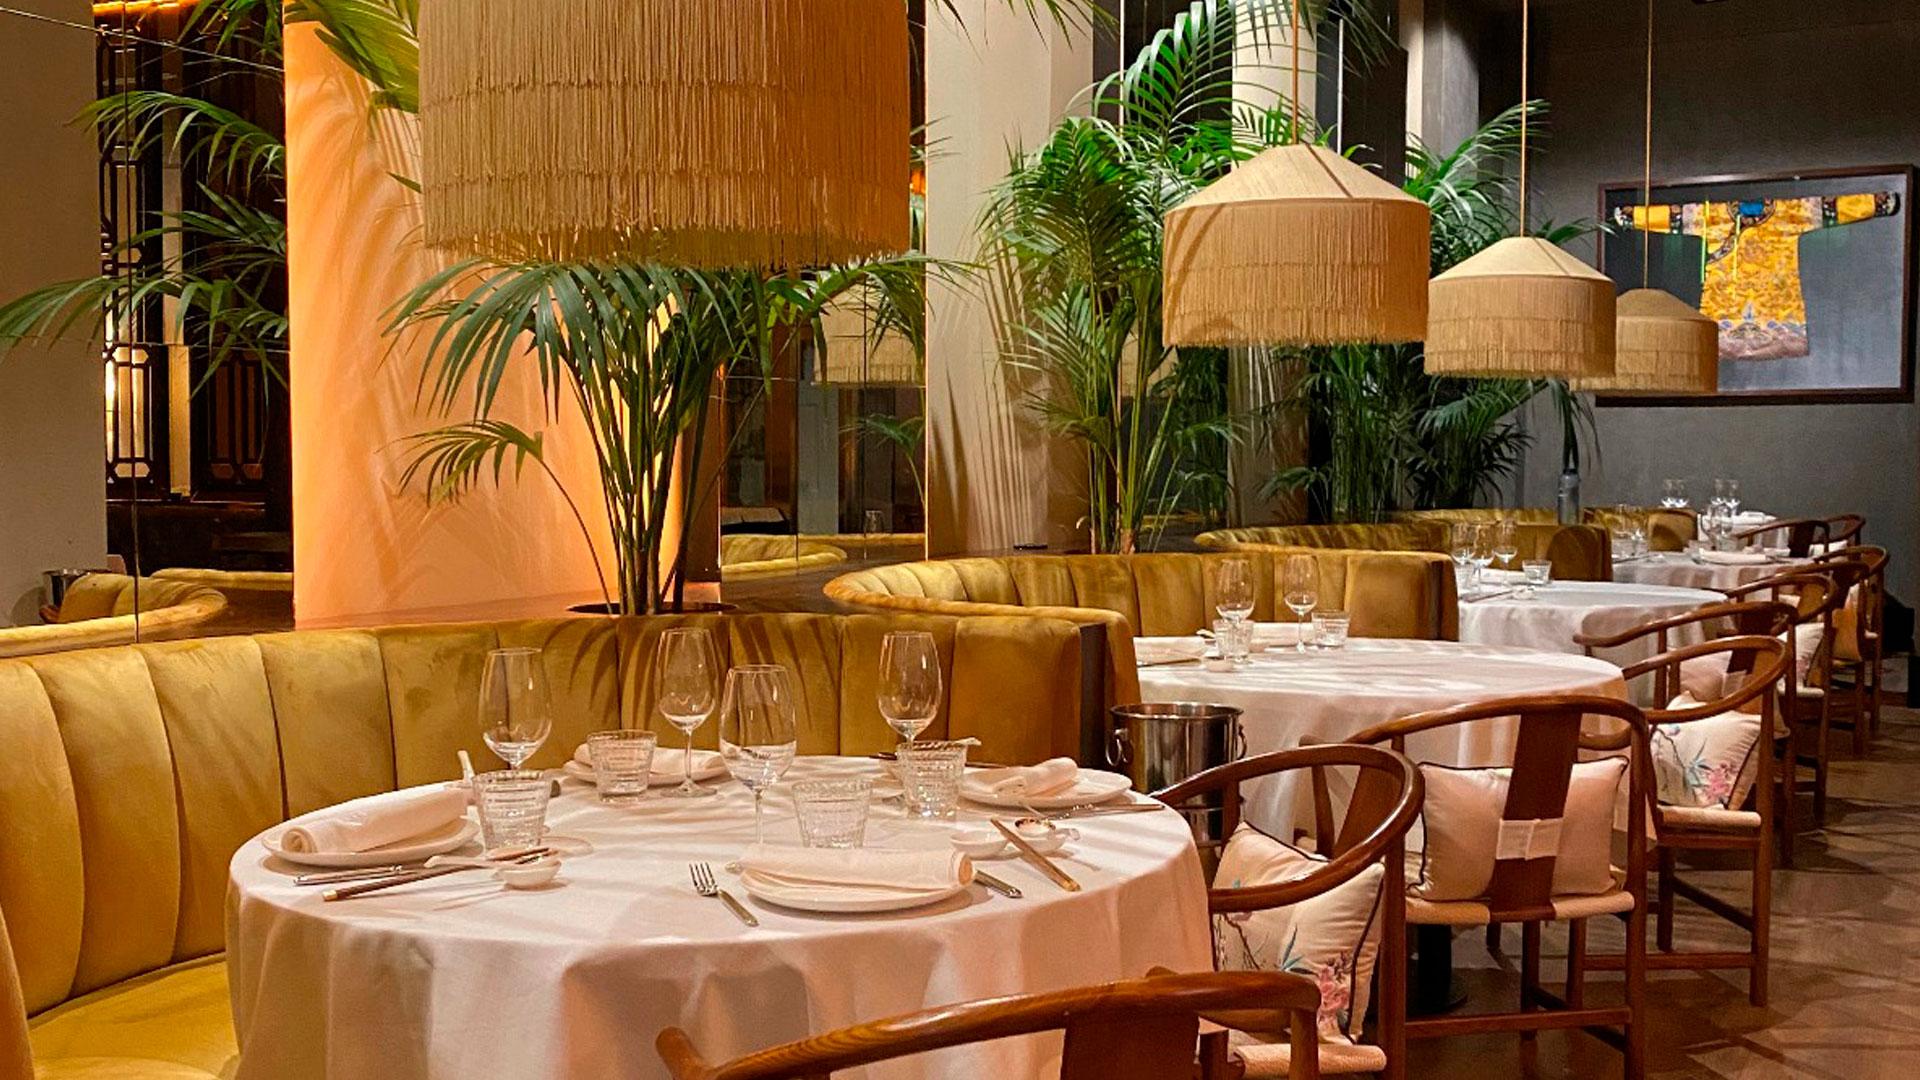 Imagen del restaurante China Crown